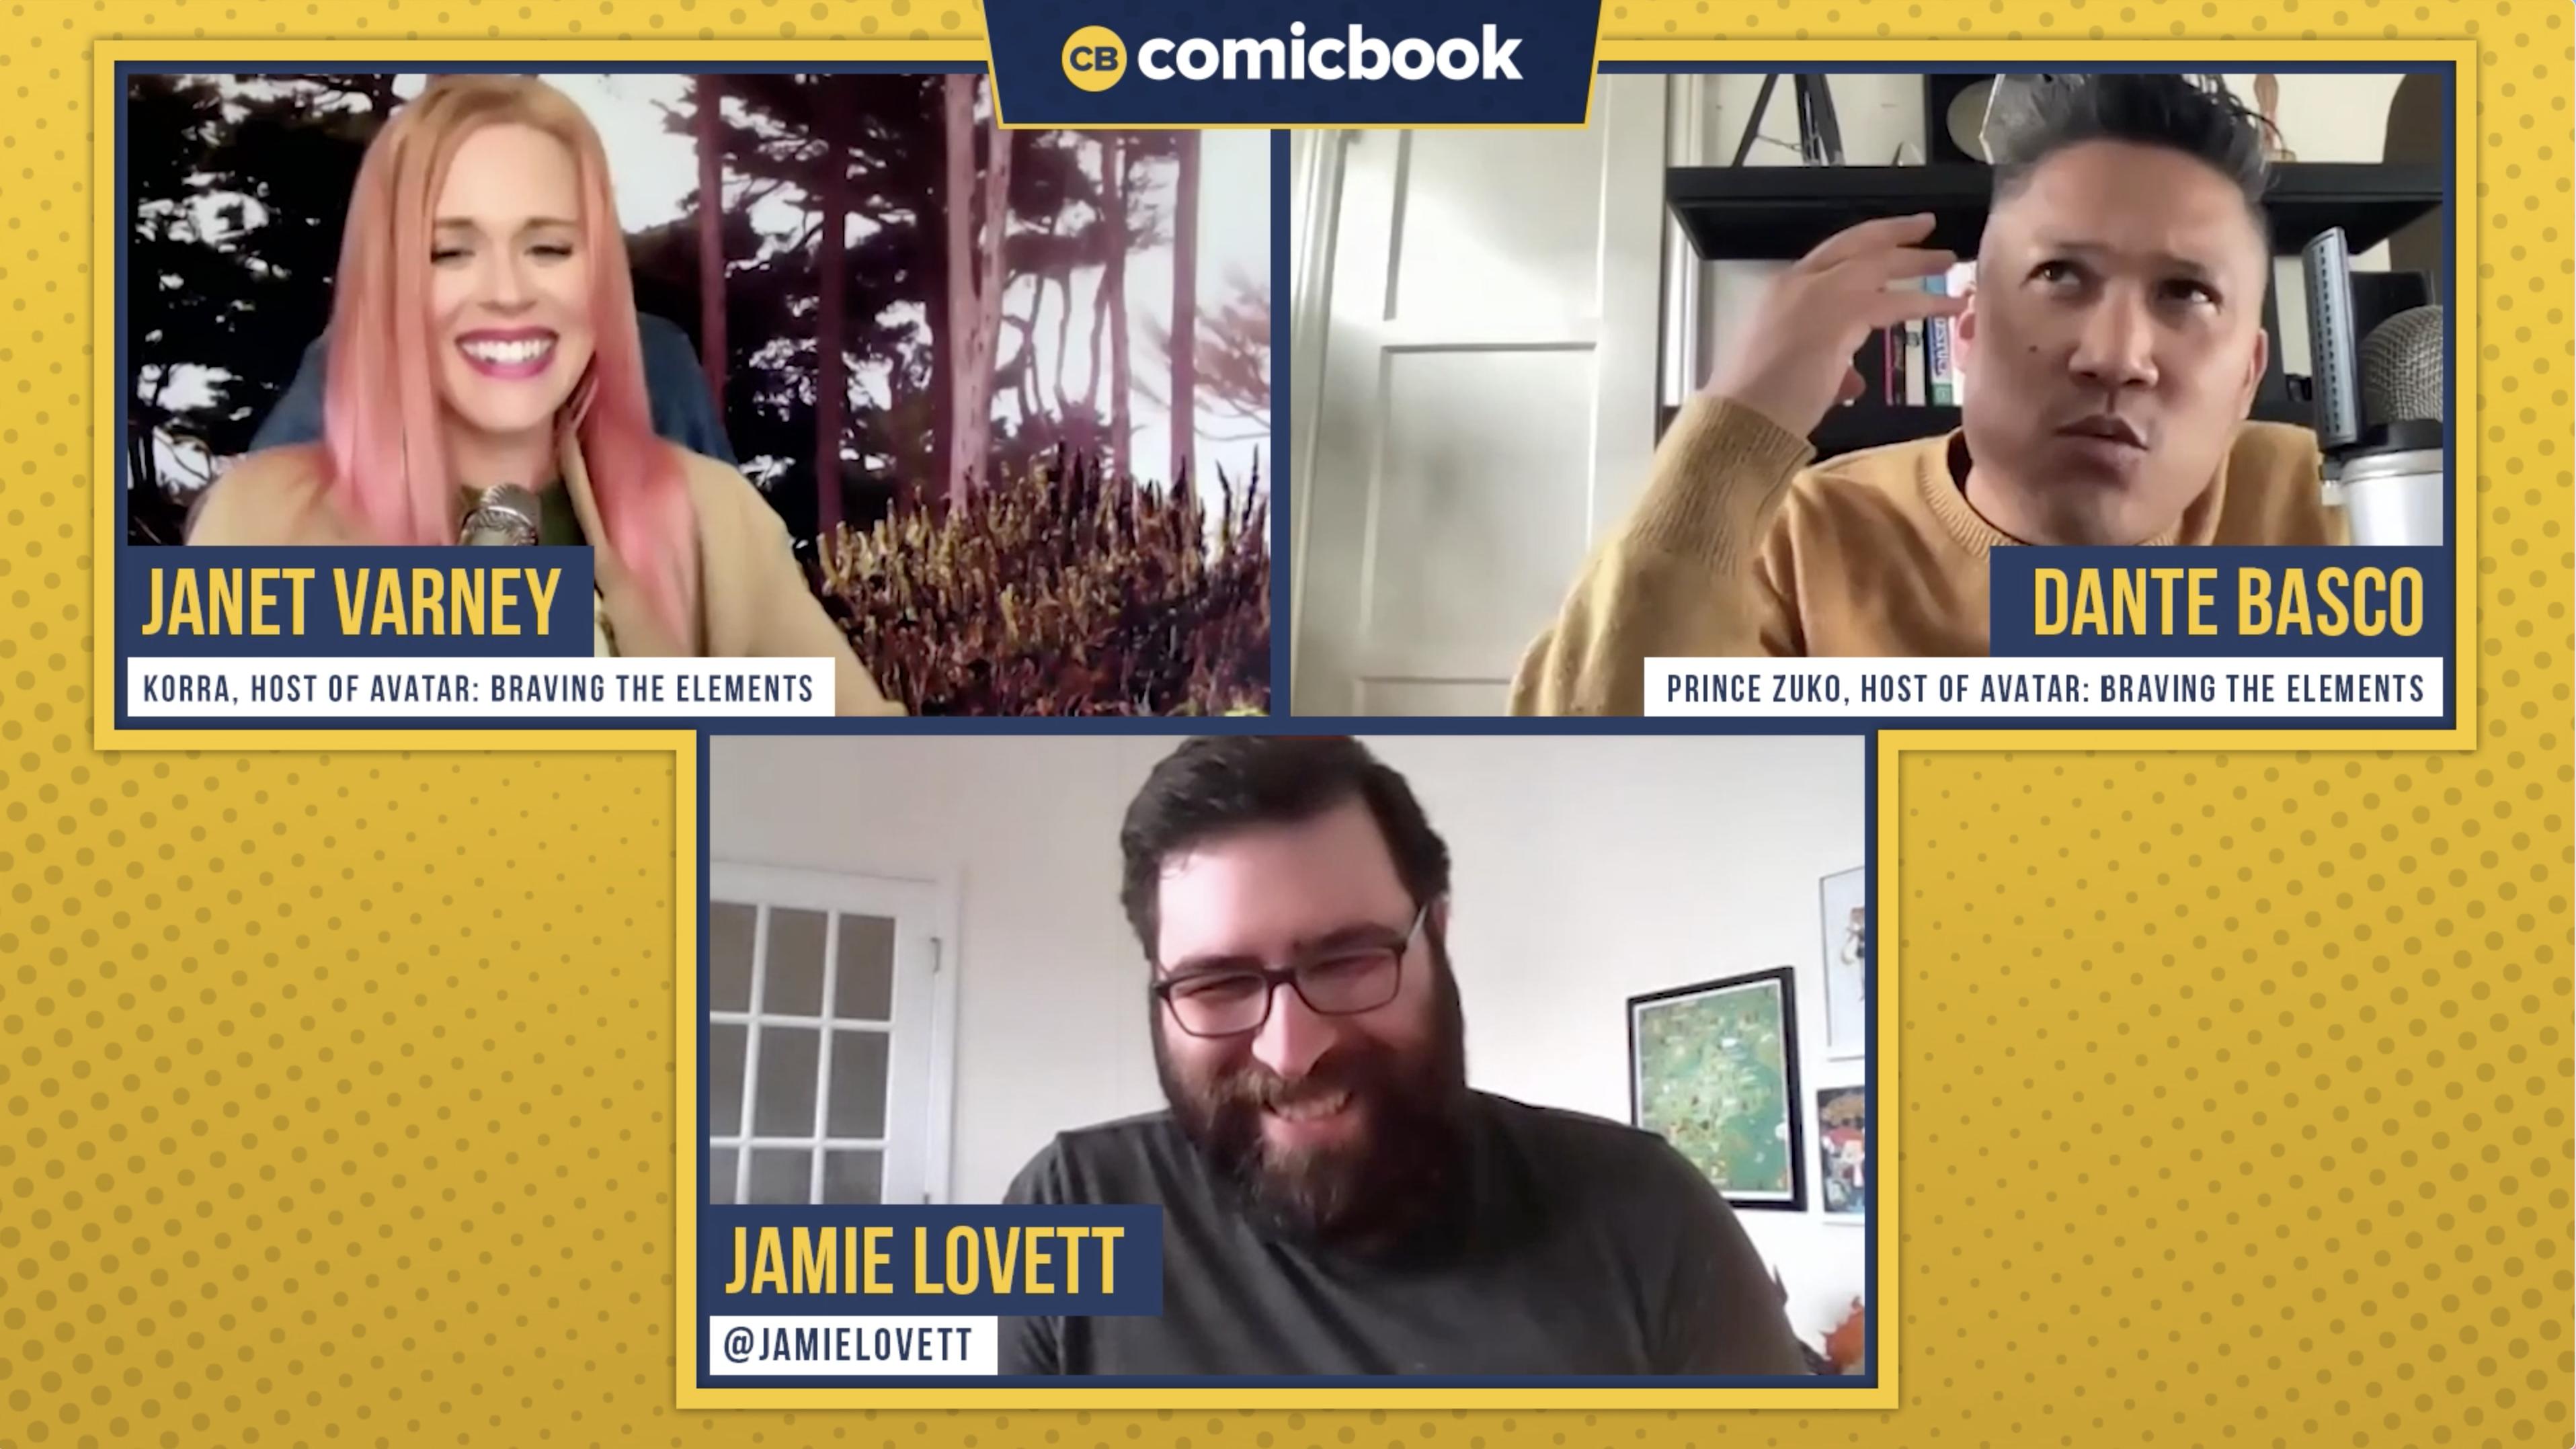 Dante Basco Janet Varney Talk Avatar Braving the Elements - Exclusive Comicbook.com Interview